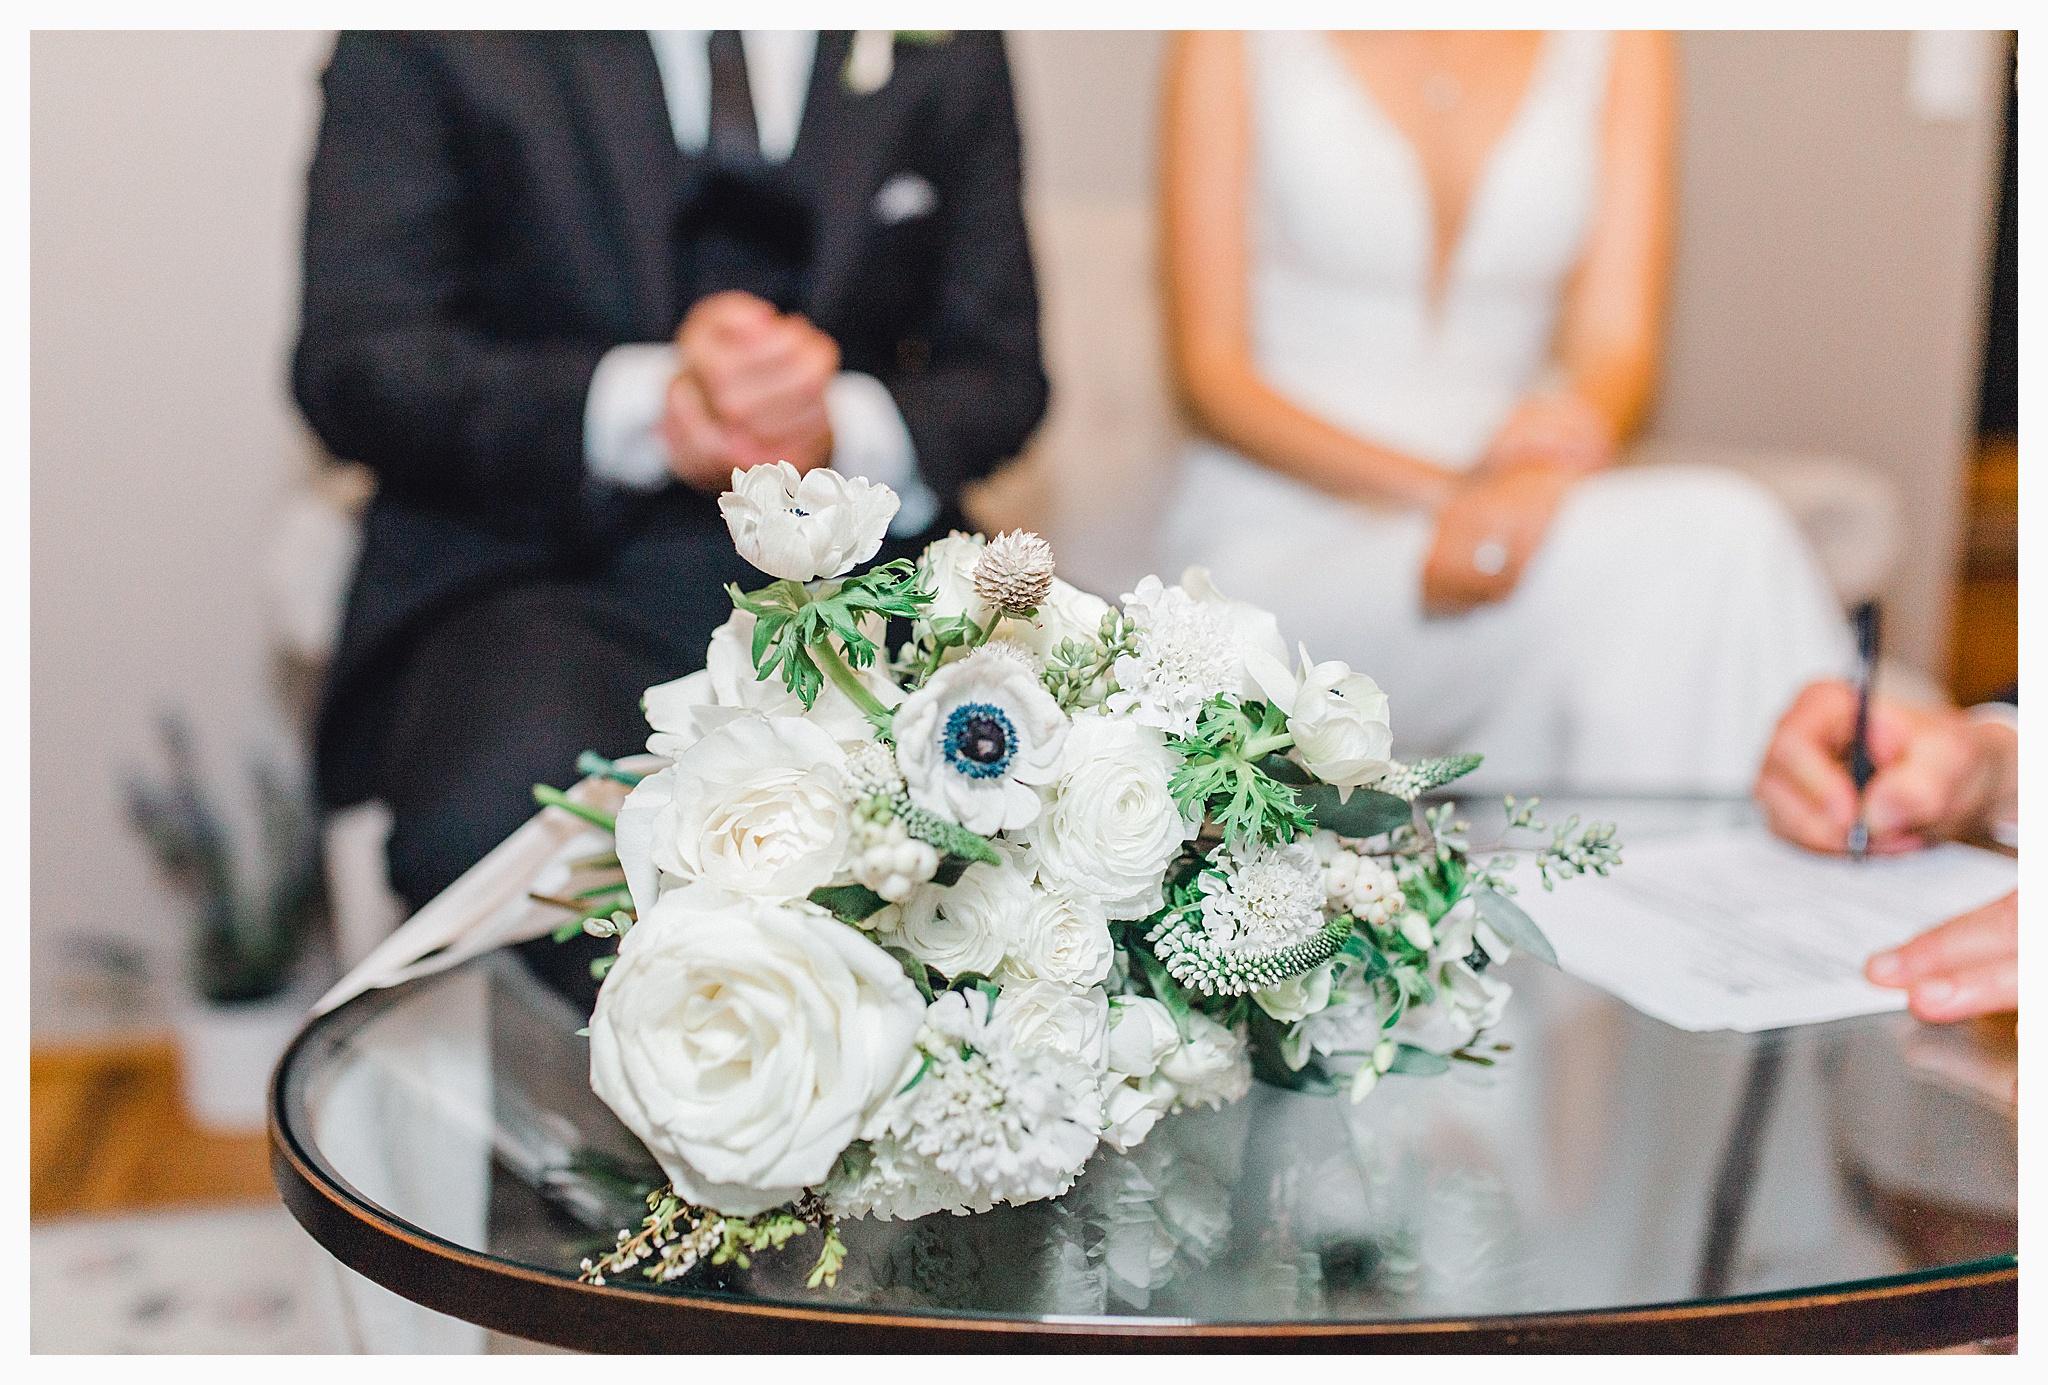 Emma Rose Company Light and Airy Wedding Photographer, Beautiful fall wedding at Rock Creek Gardens Venue in Puyallup, Washington._0089.jpg